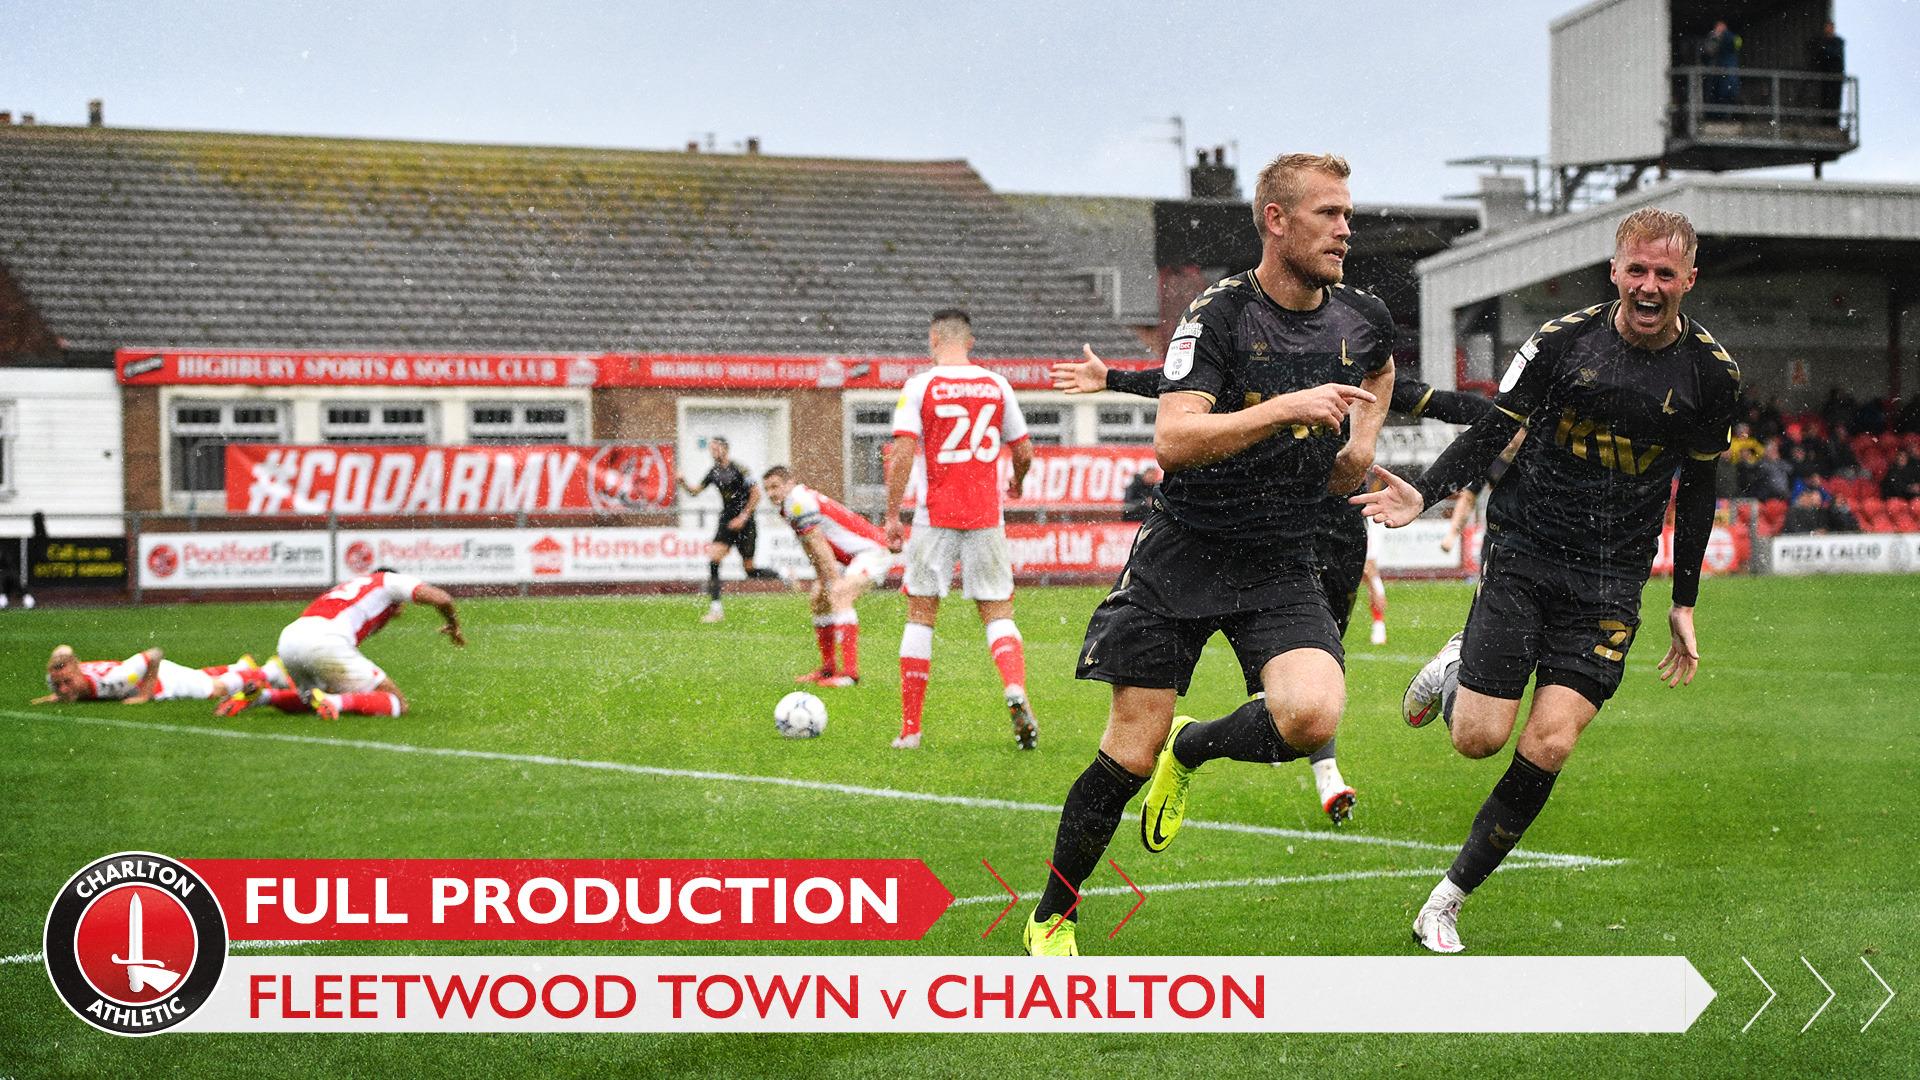 CharltonTV | Full broadcast - Fleetwood Town (October 2021)